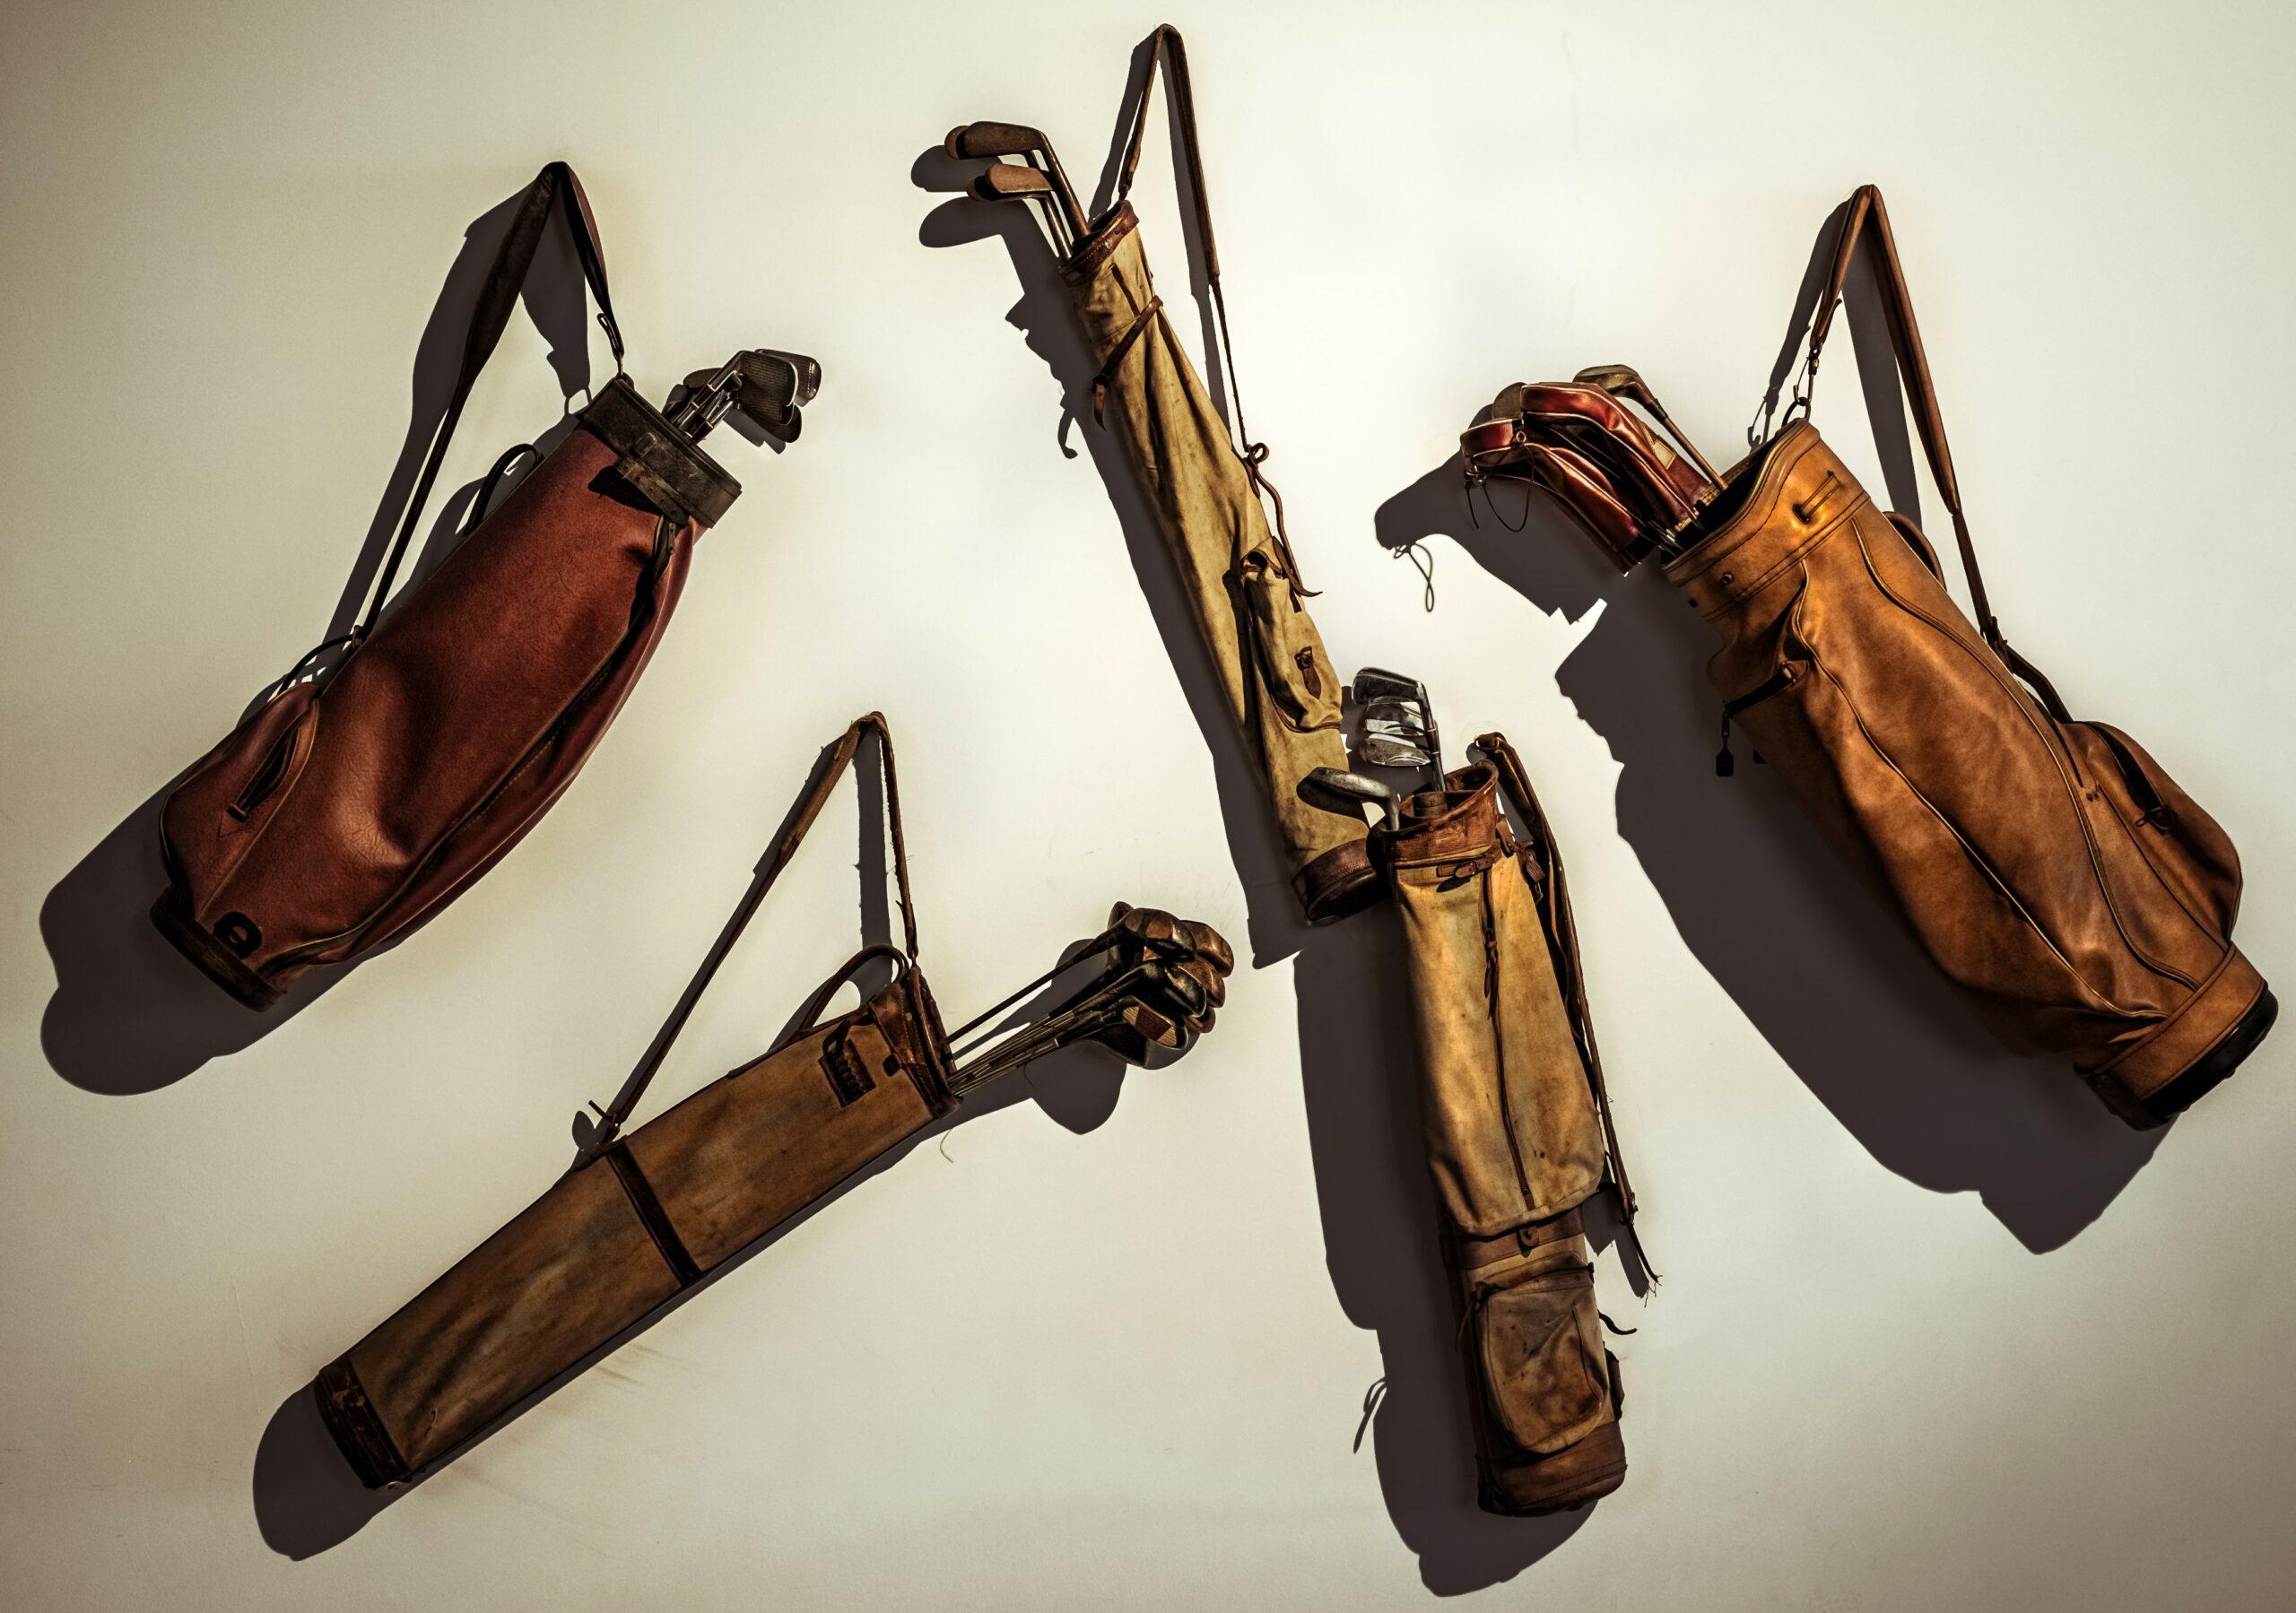 Vintage Sunday Golf Bags